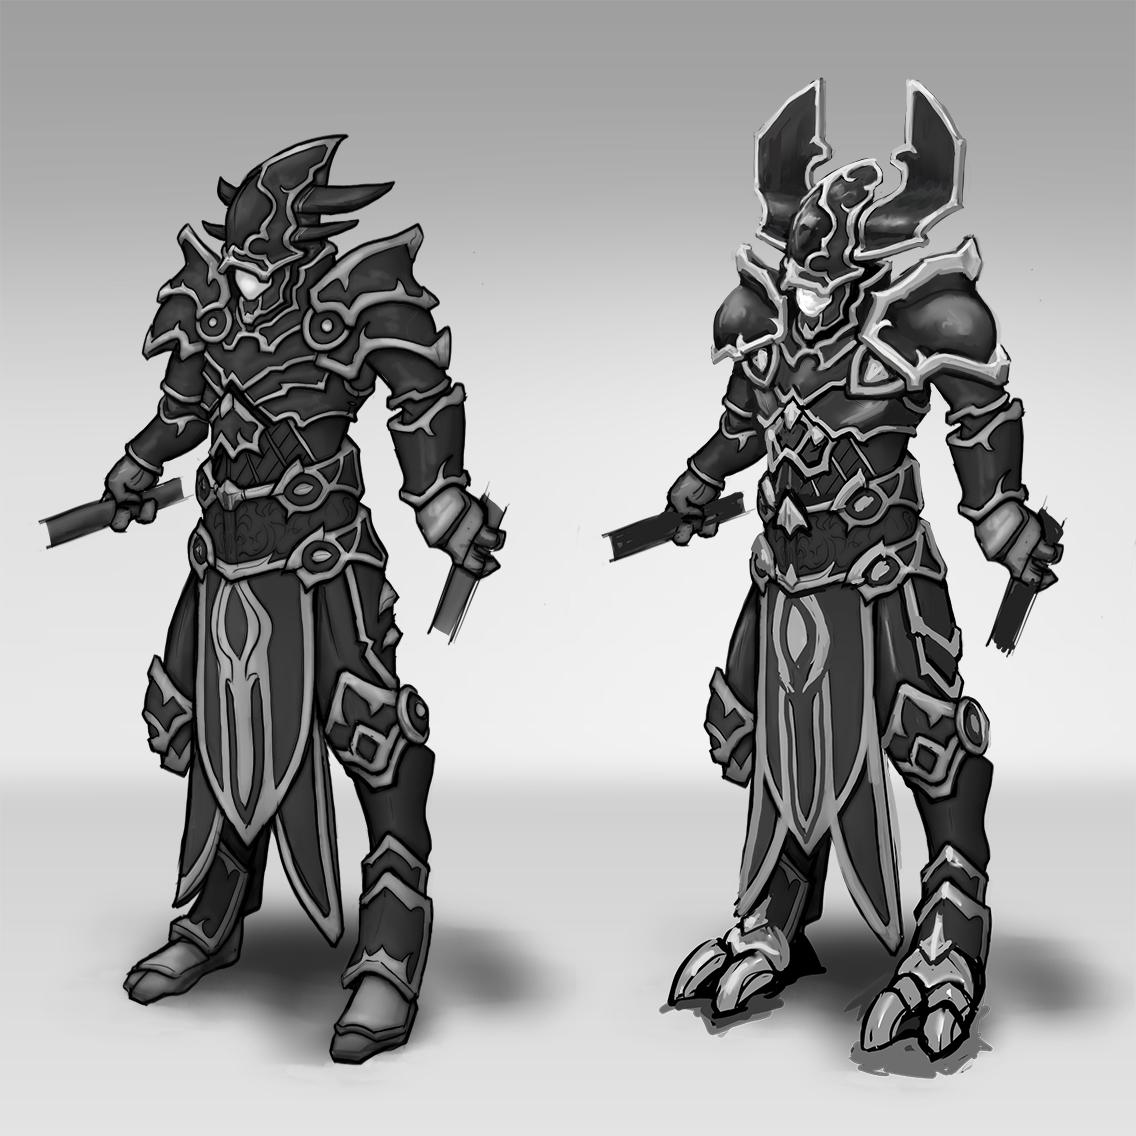 Obsidianwarrior_Concepts_170829.jpg